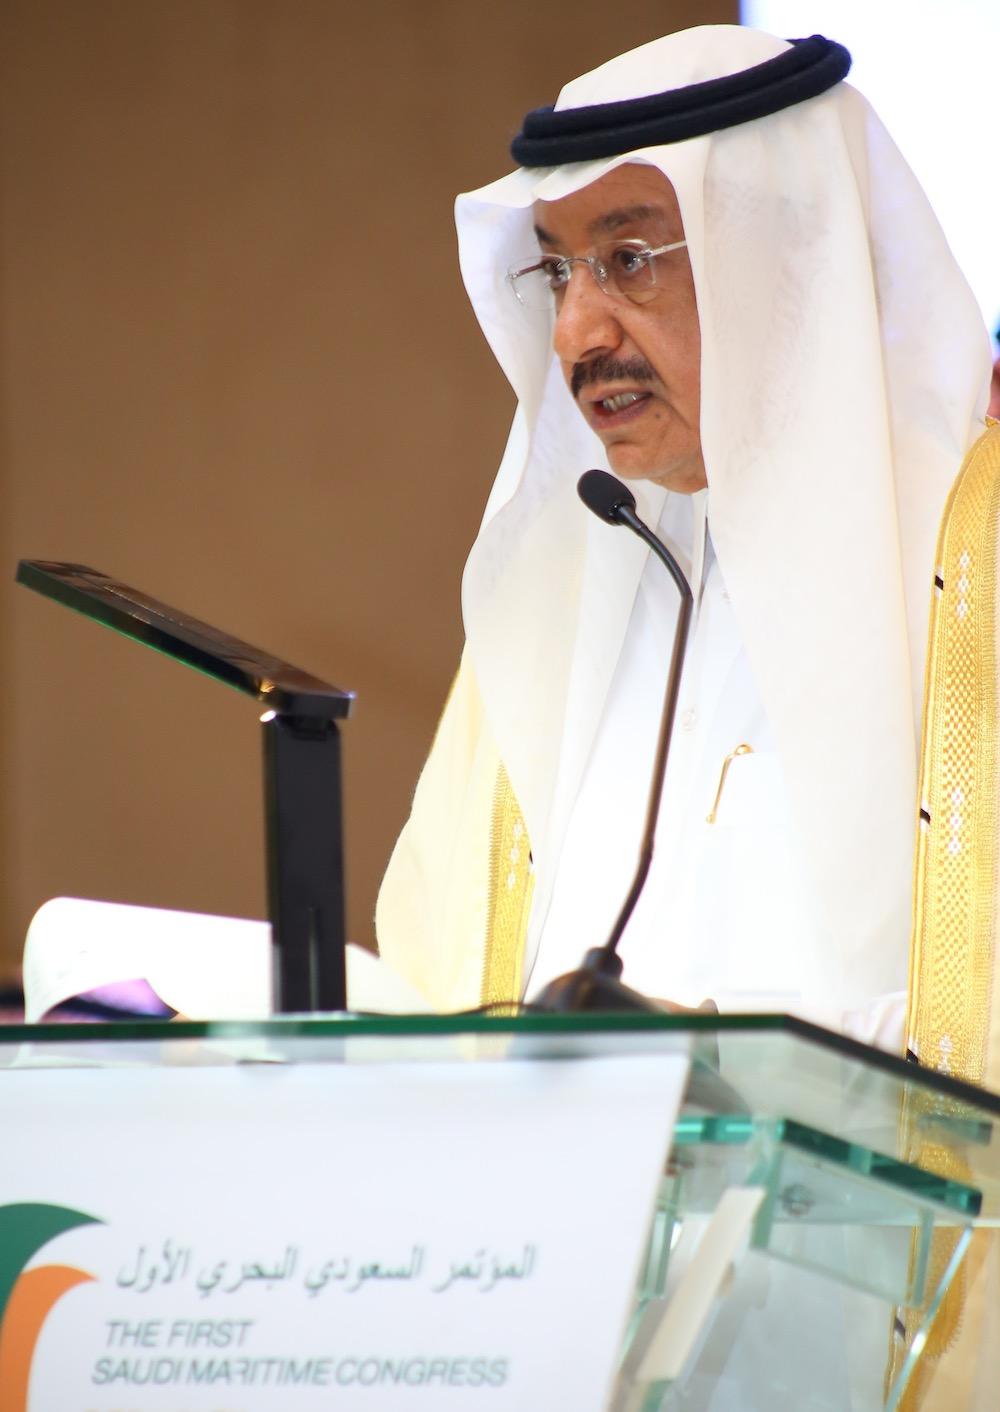 HE Al-Suraiseri inaugurates first Saudi Maritime Congress